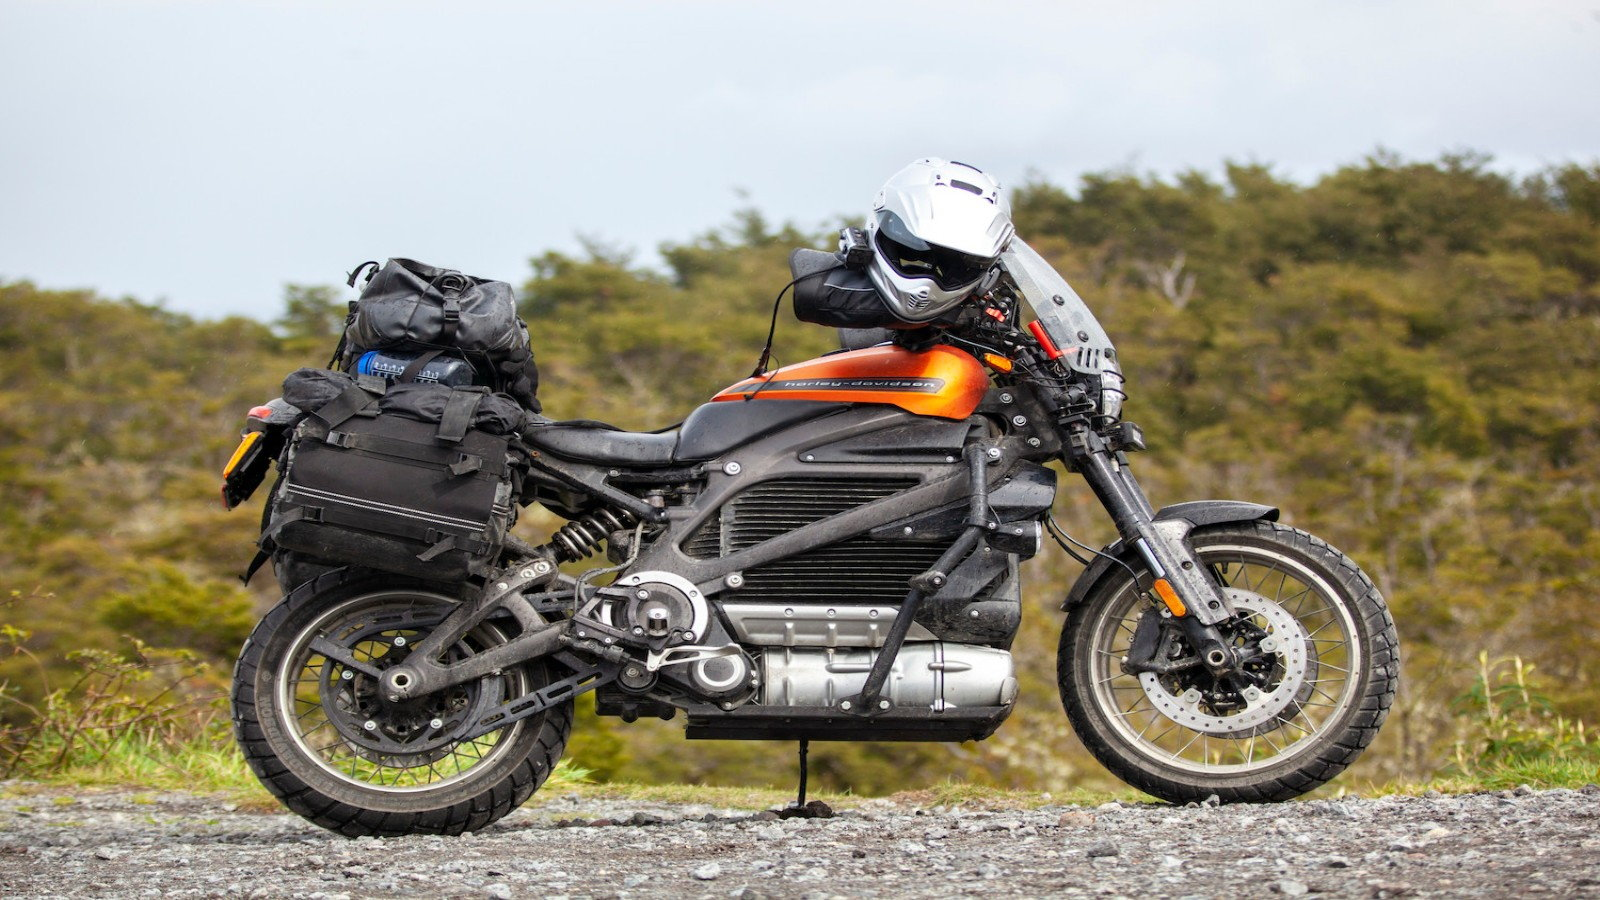 Harley-Davidson's